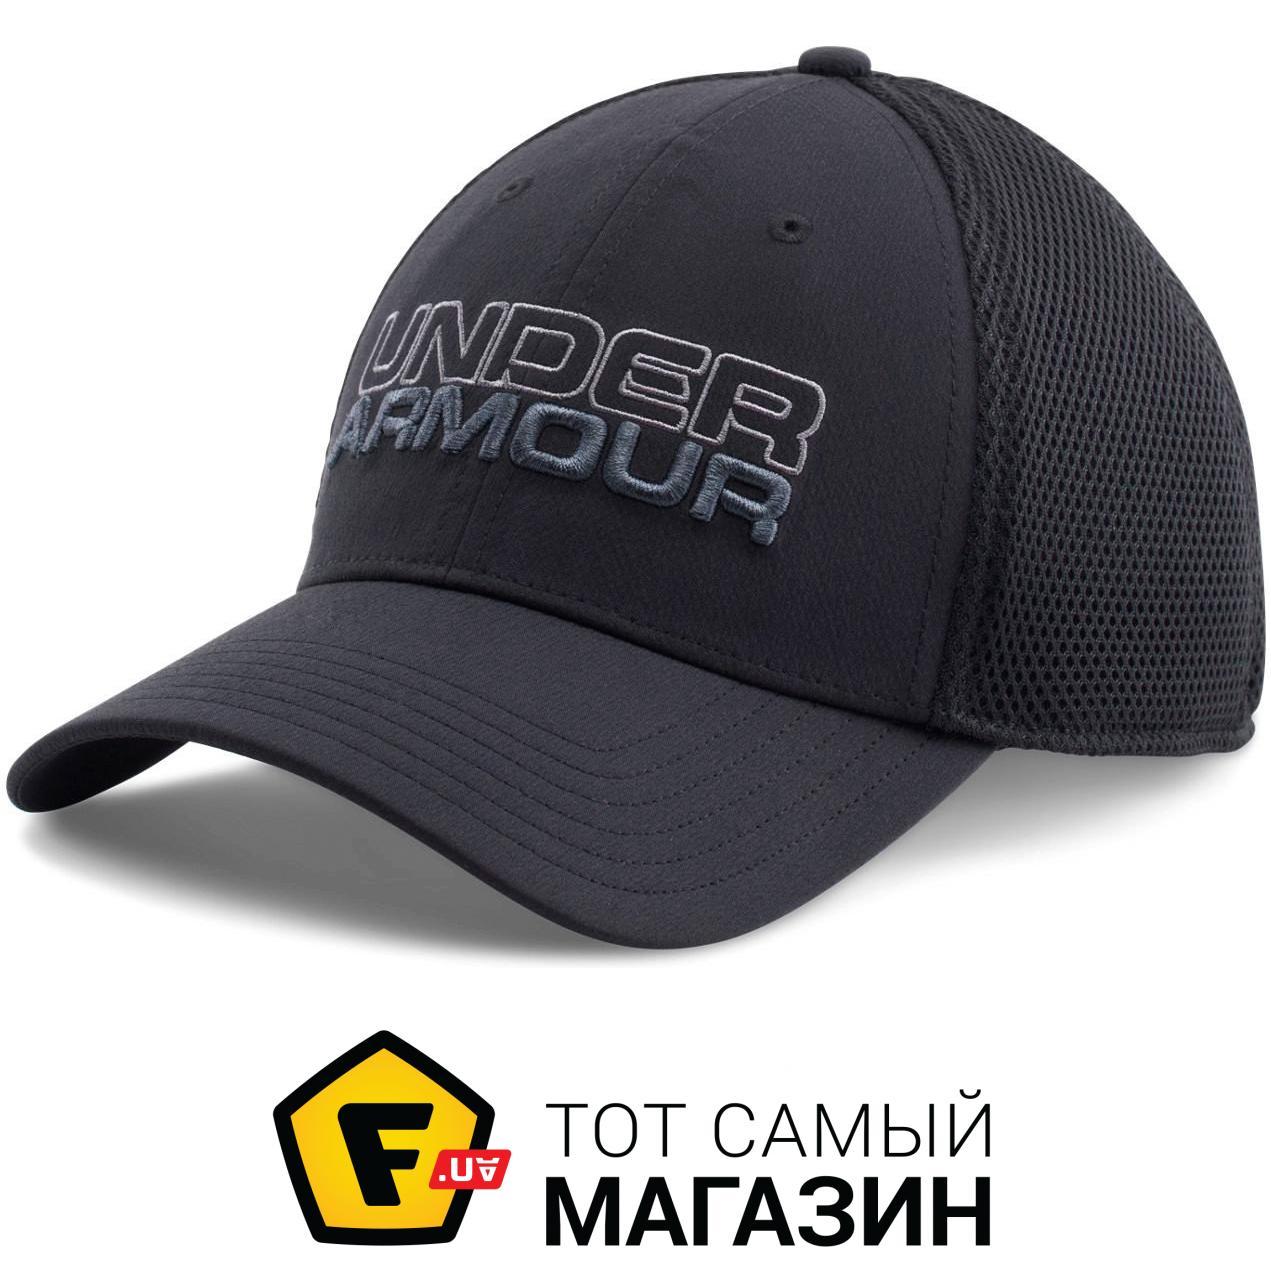 Кепка Under Armour Mens cap M L aba7485a9d3b8